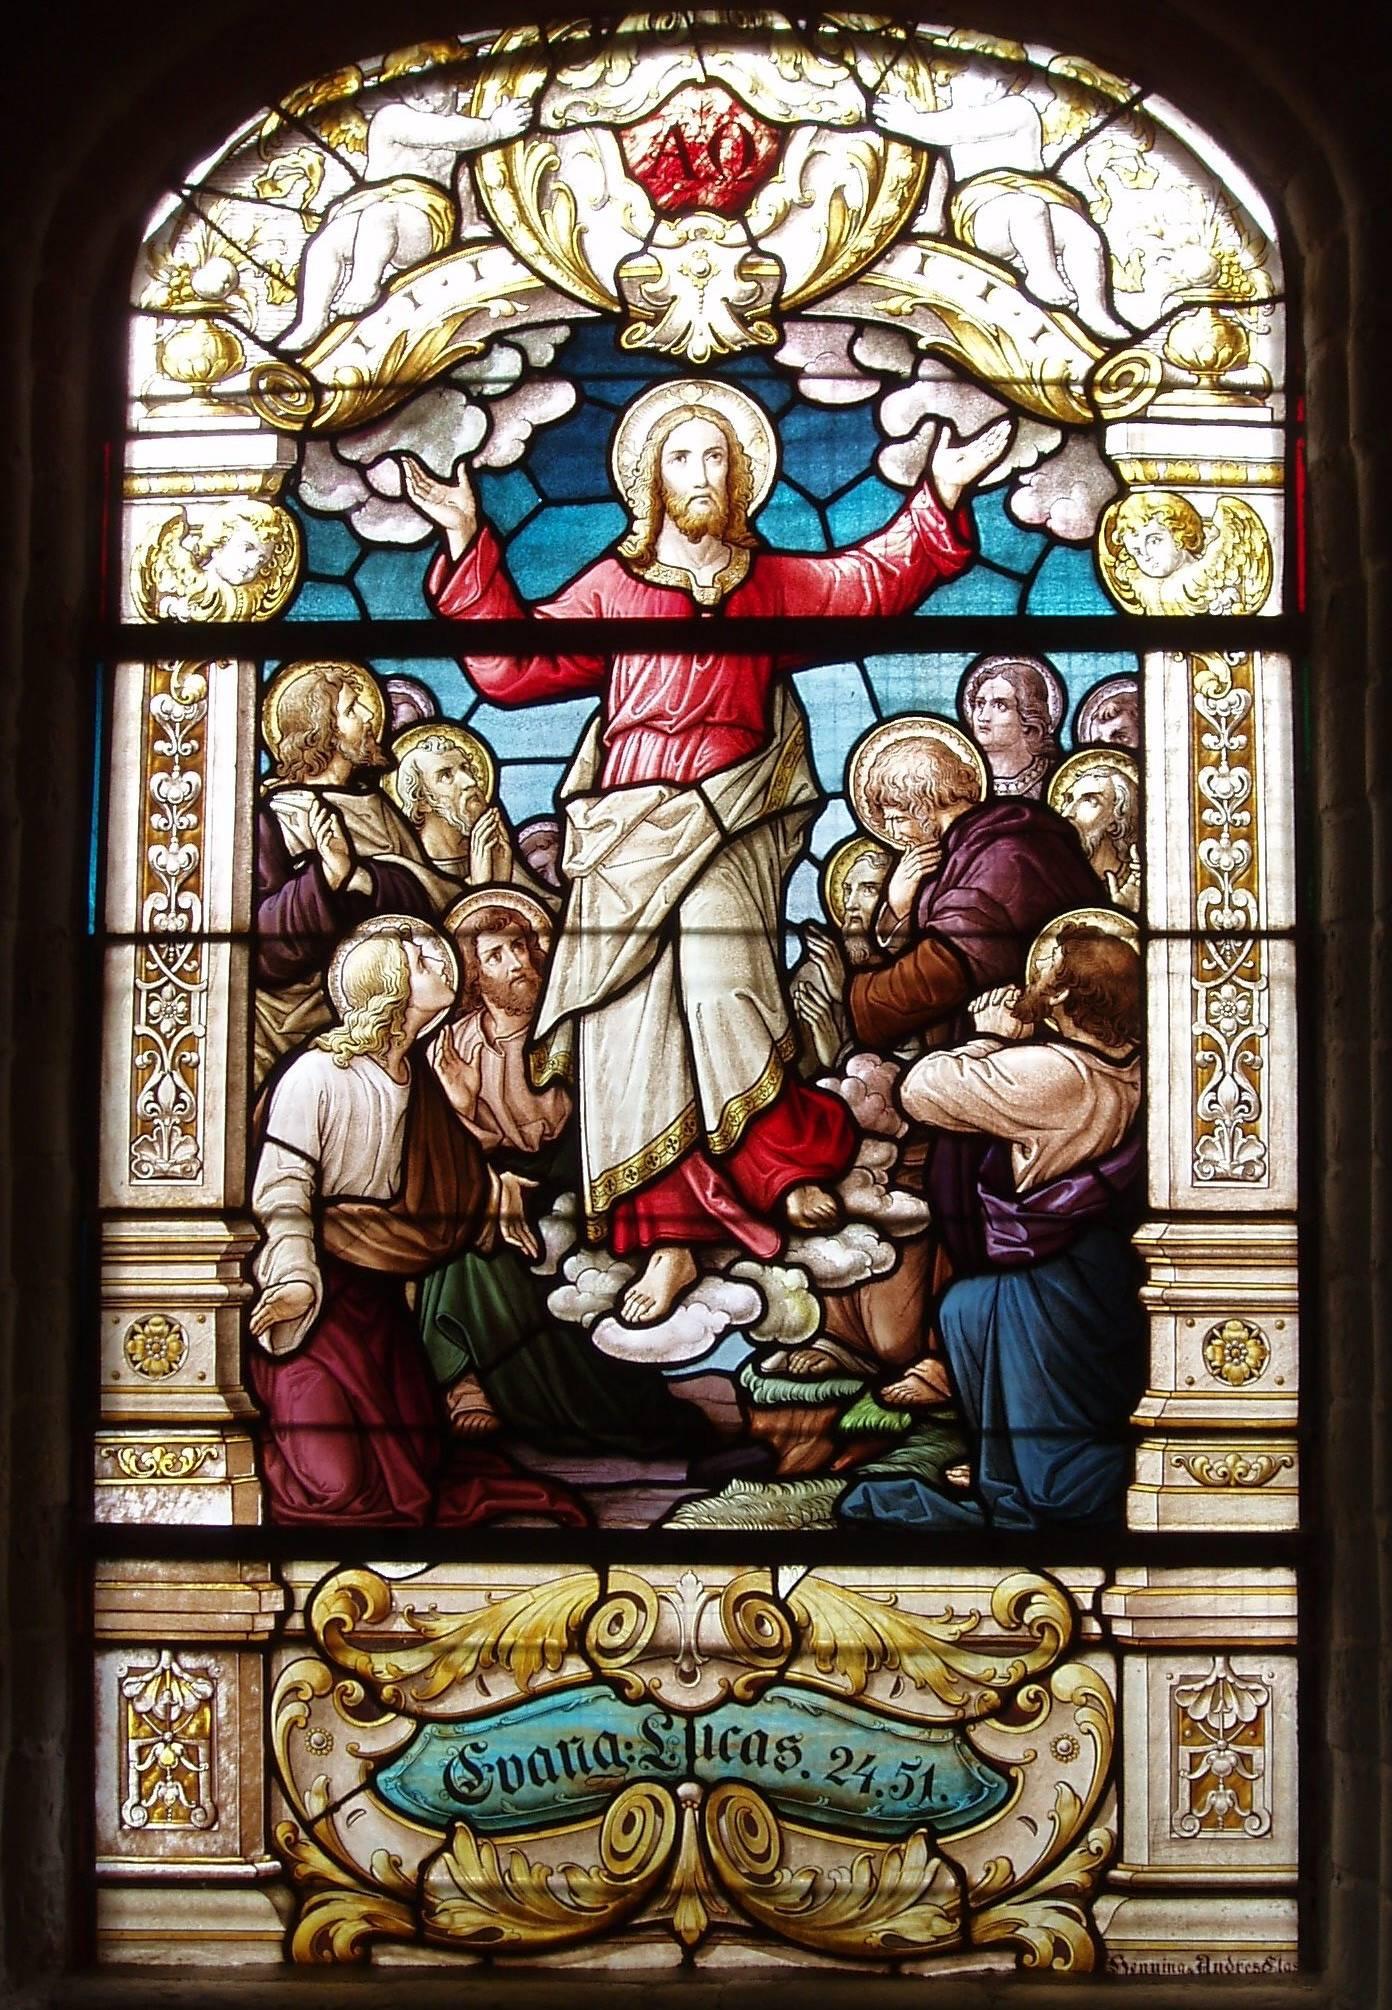 Kirchenfenster im Oldendorfer Altarraum - Christi Himmelfahrt